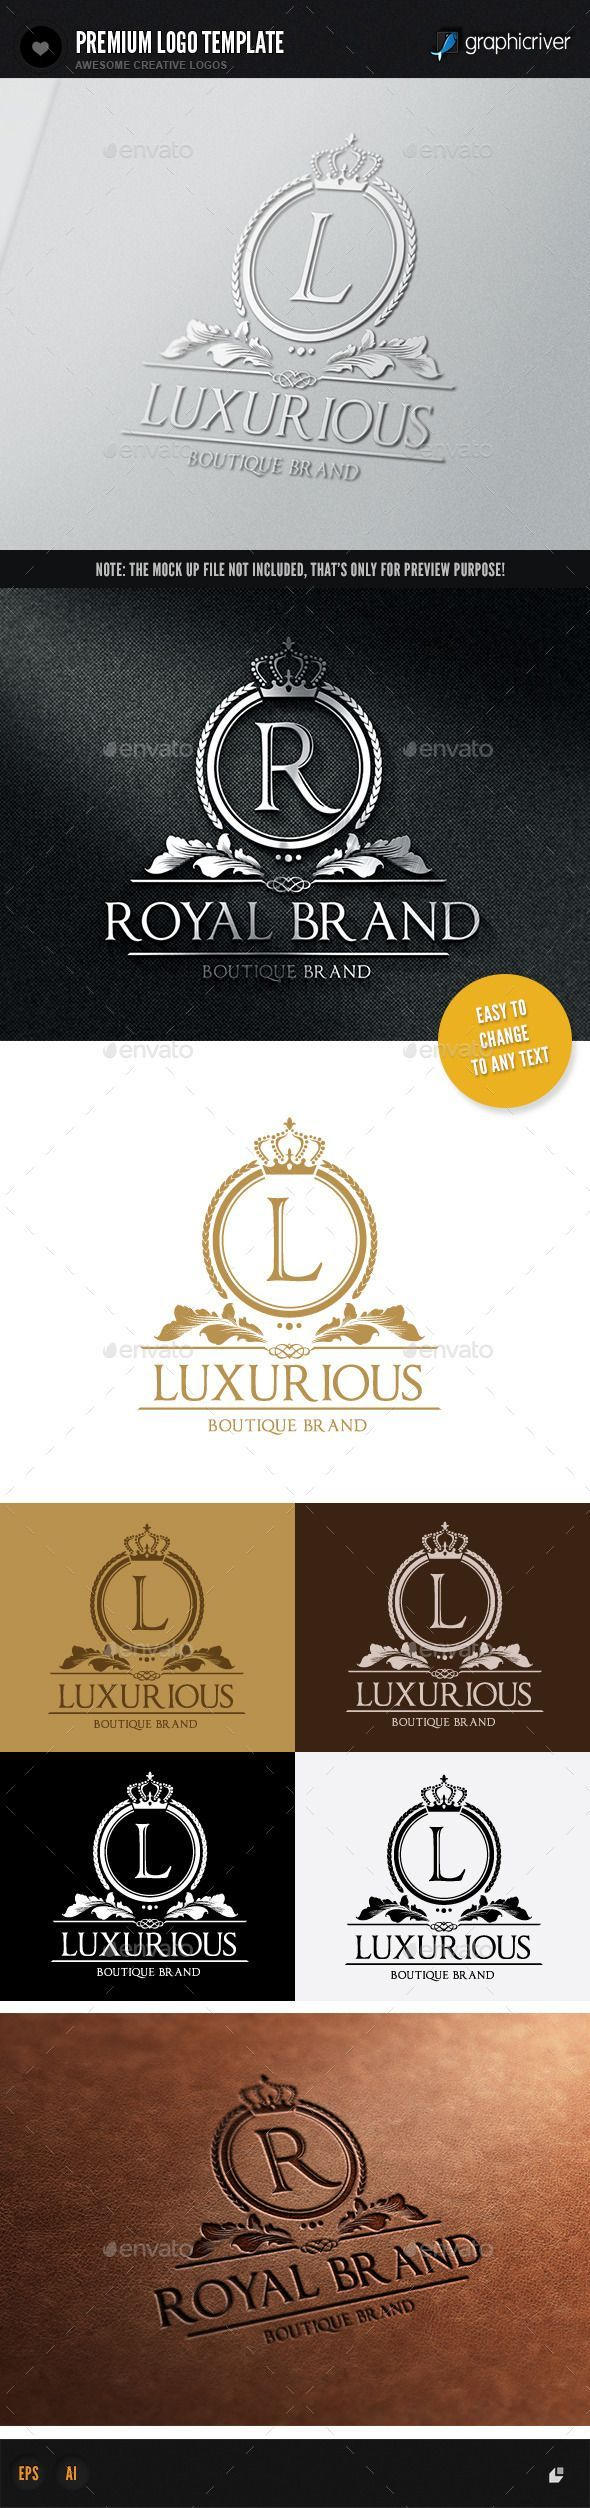 Luxurious Brand Template #design Download: http://graphicriver.net/item/luxurious-brand/9846671?ref=ksioks